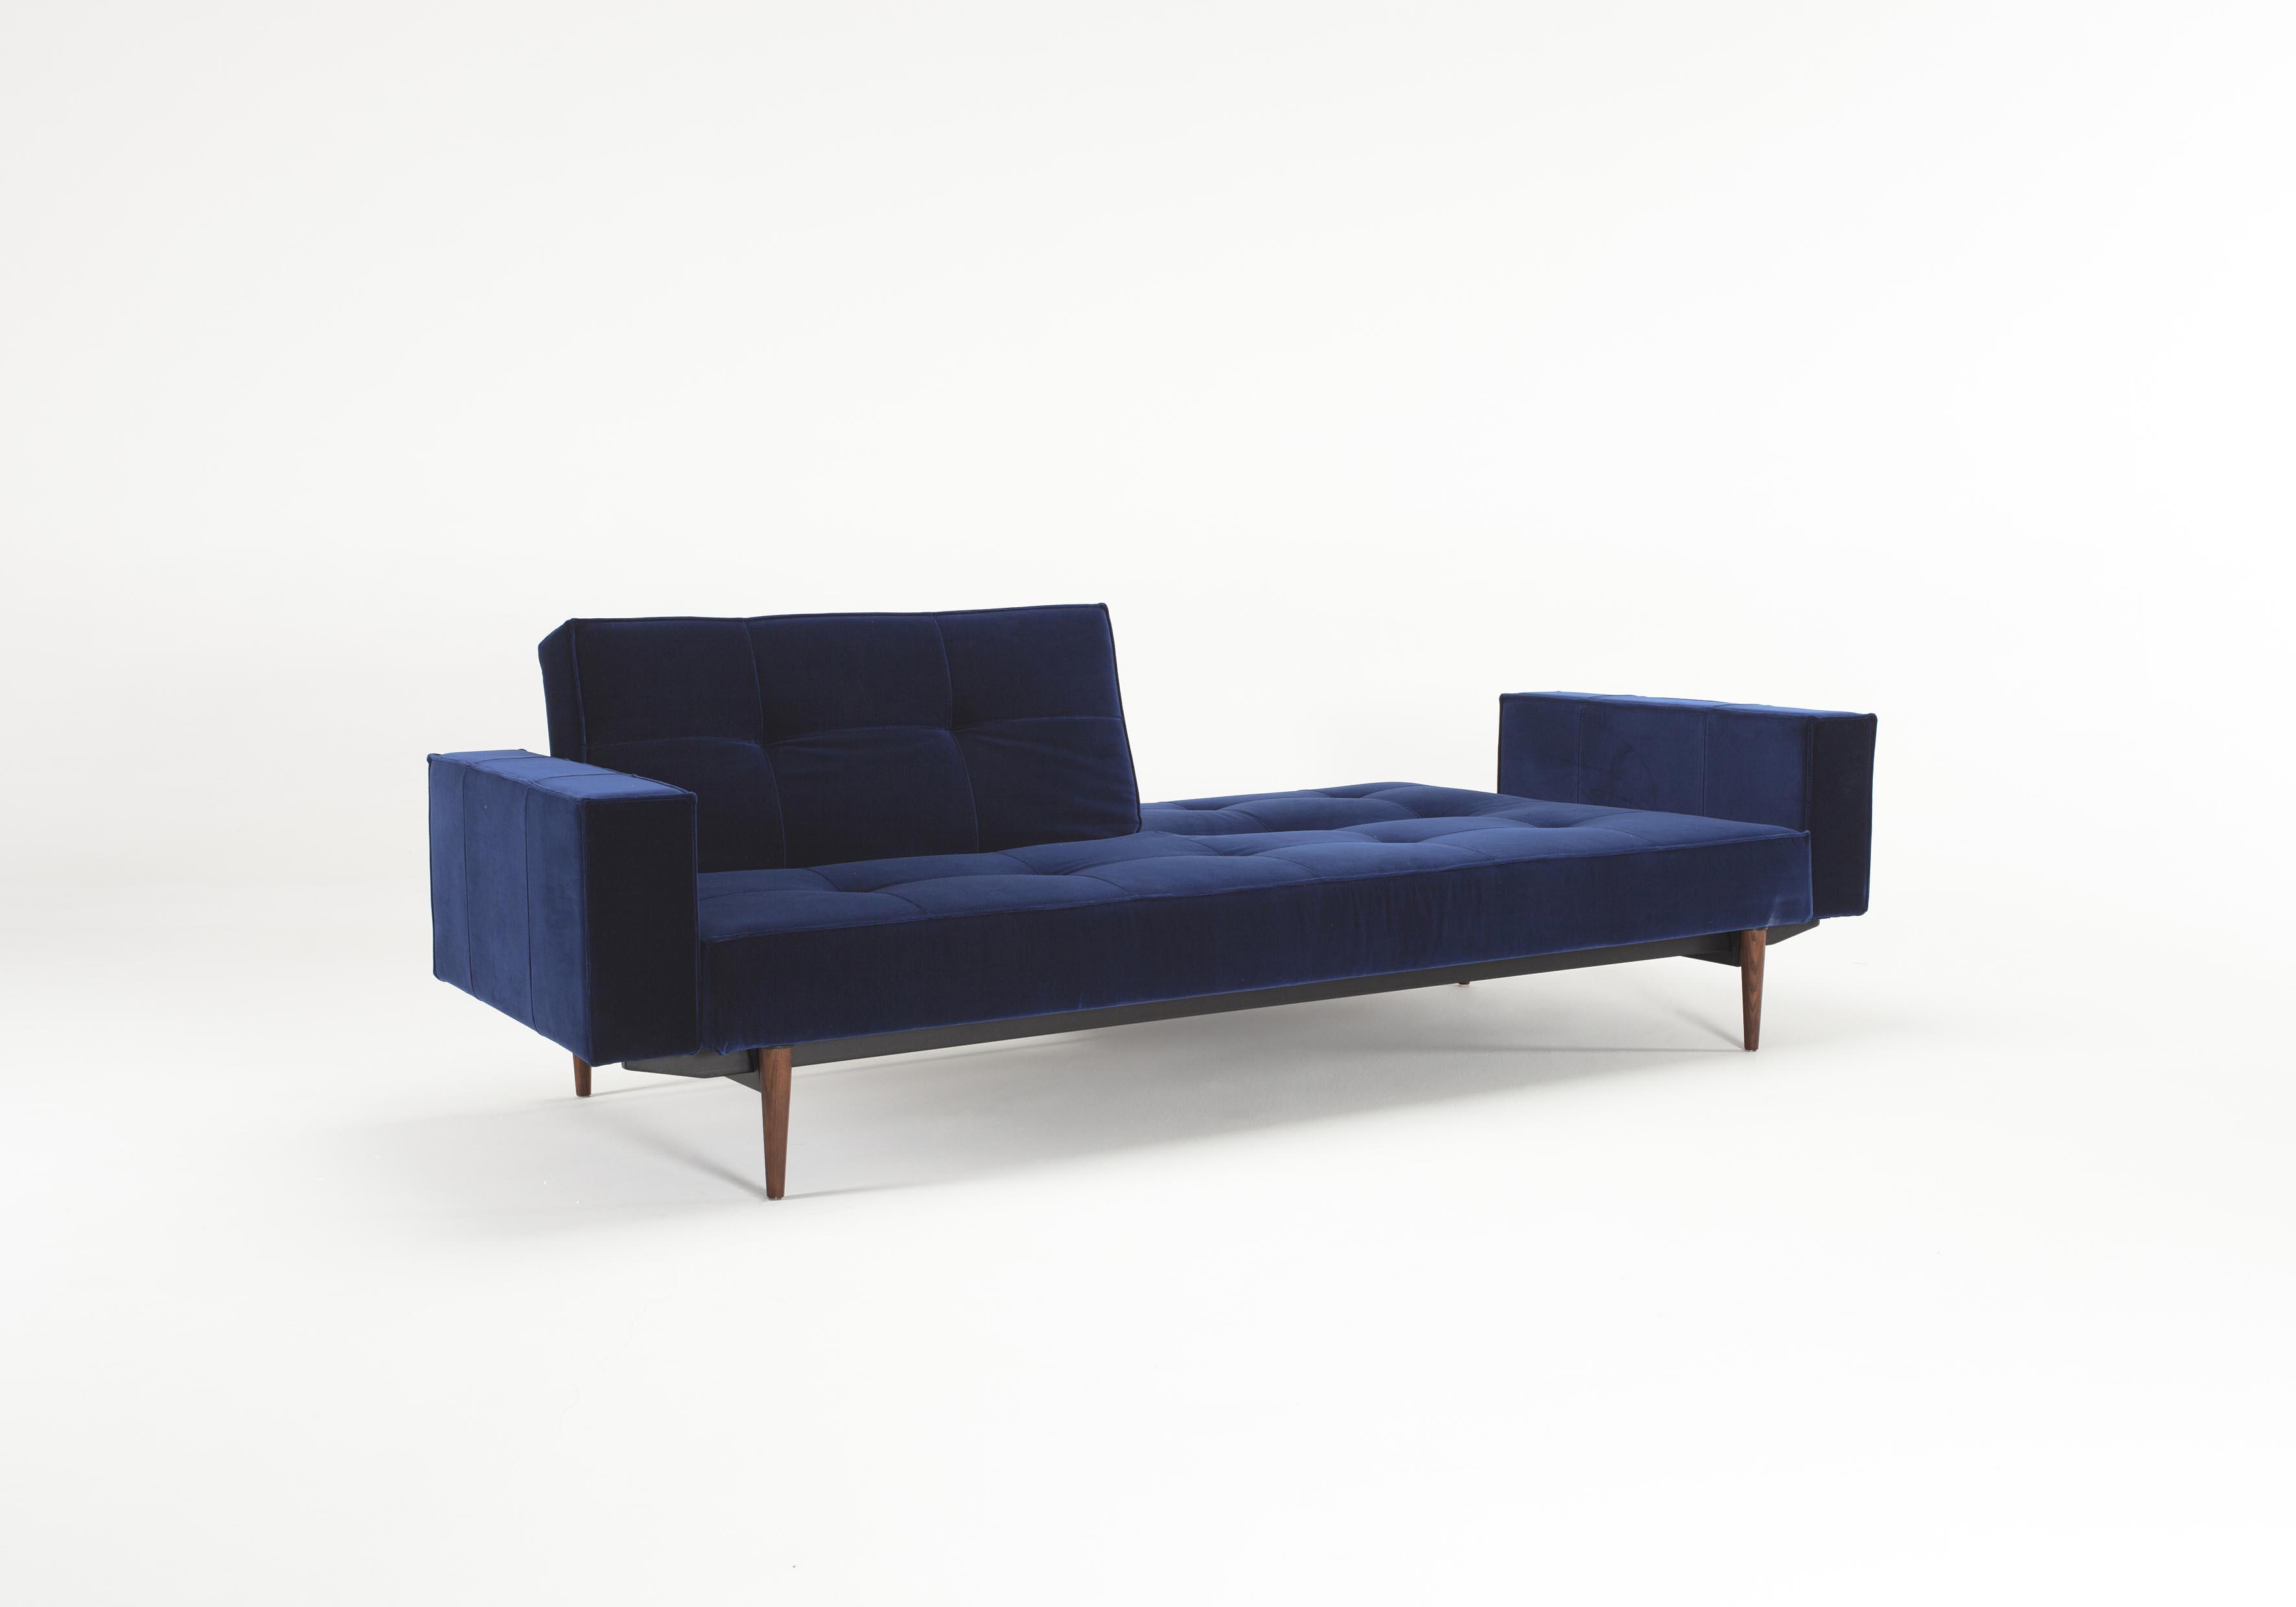 Splitback Sofa Bed W Arms Vintage Velvet Blue By Innovation